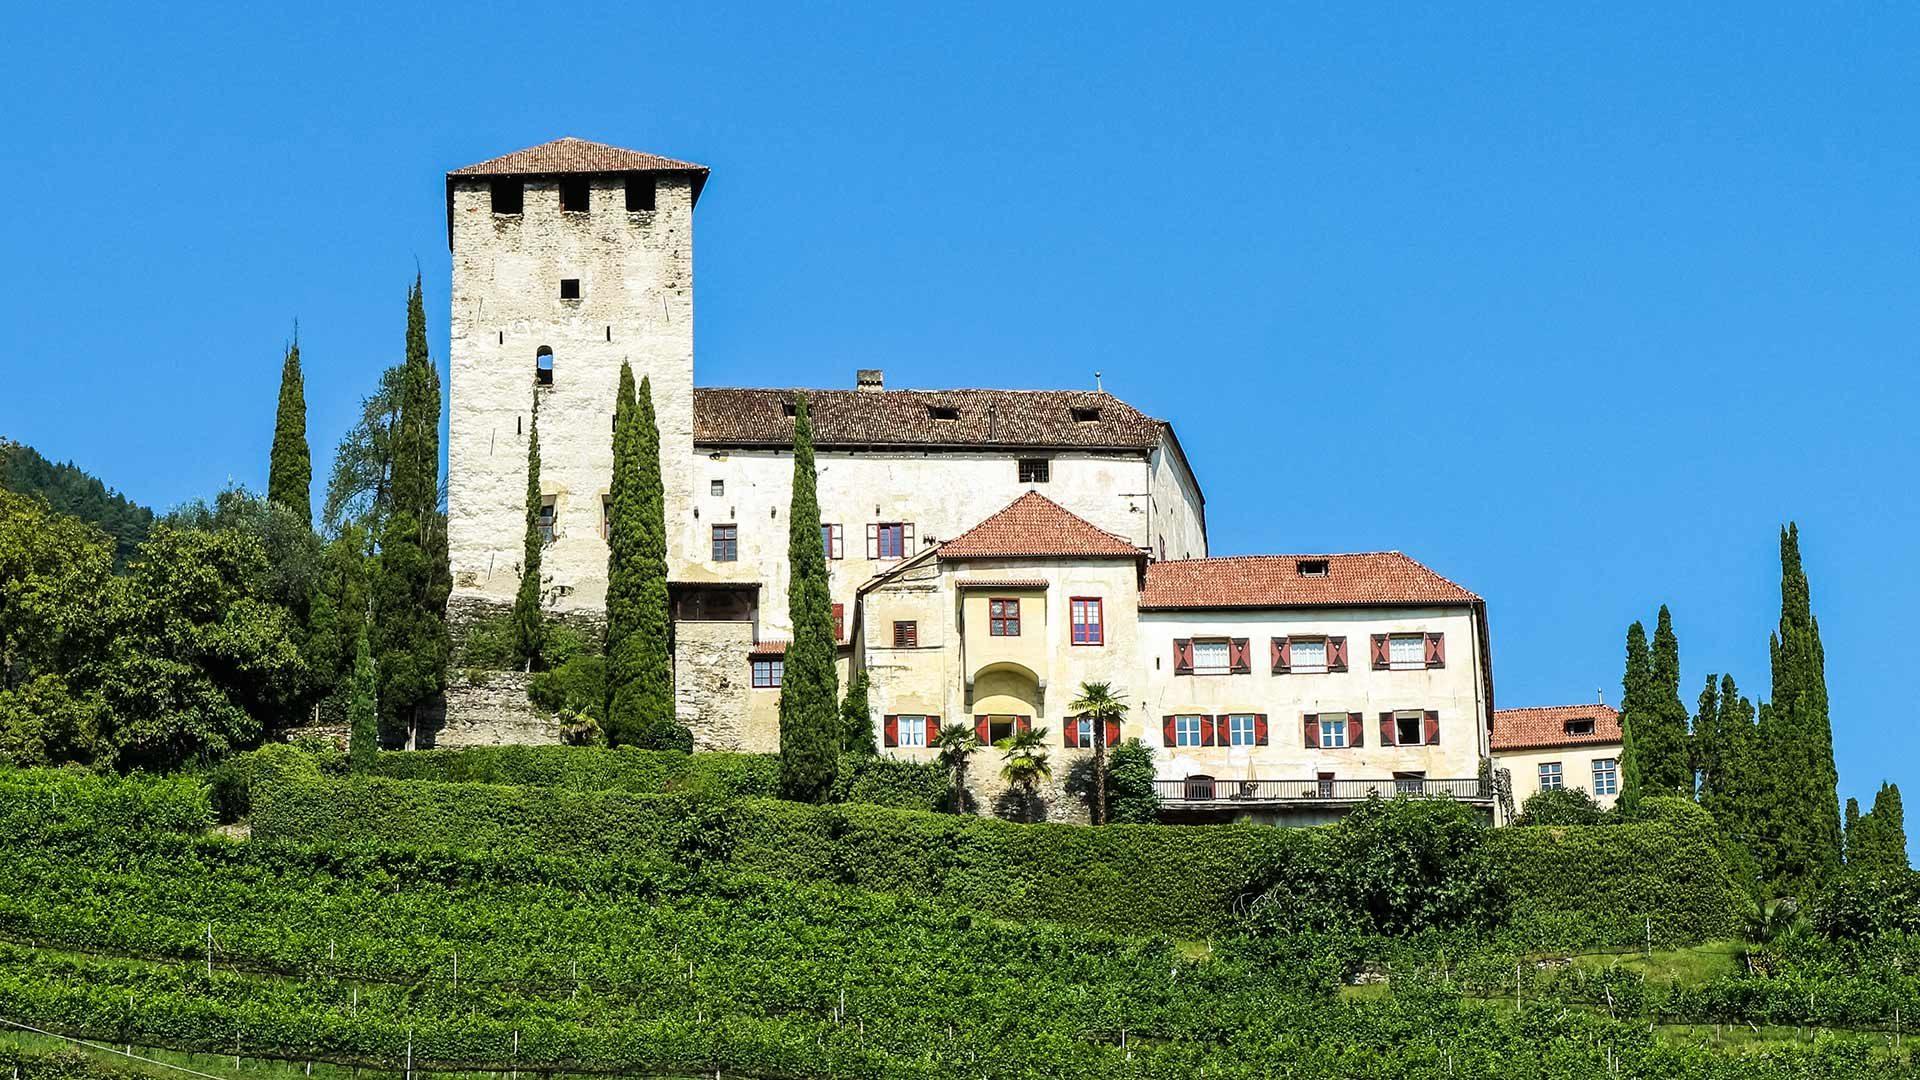 Castel Lebenberg in Alto Adige